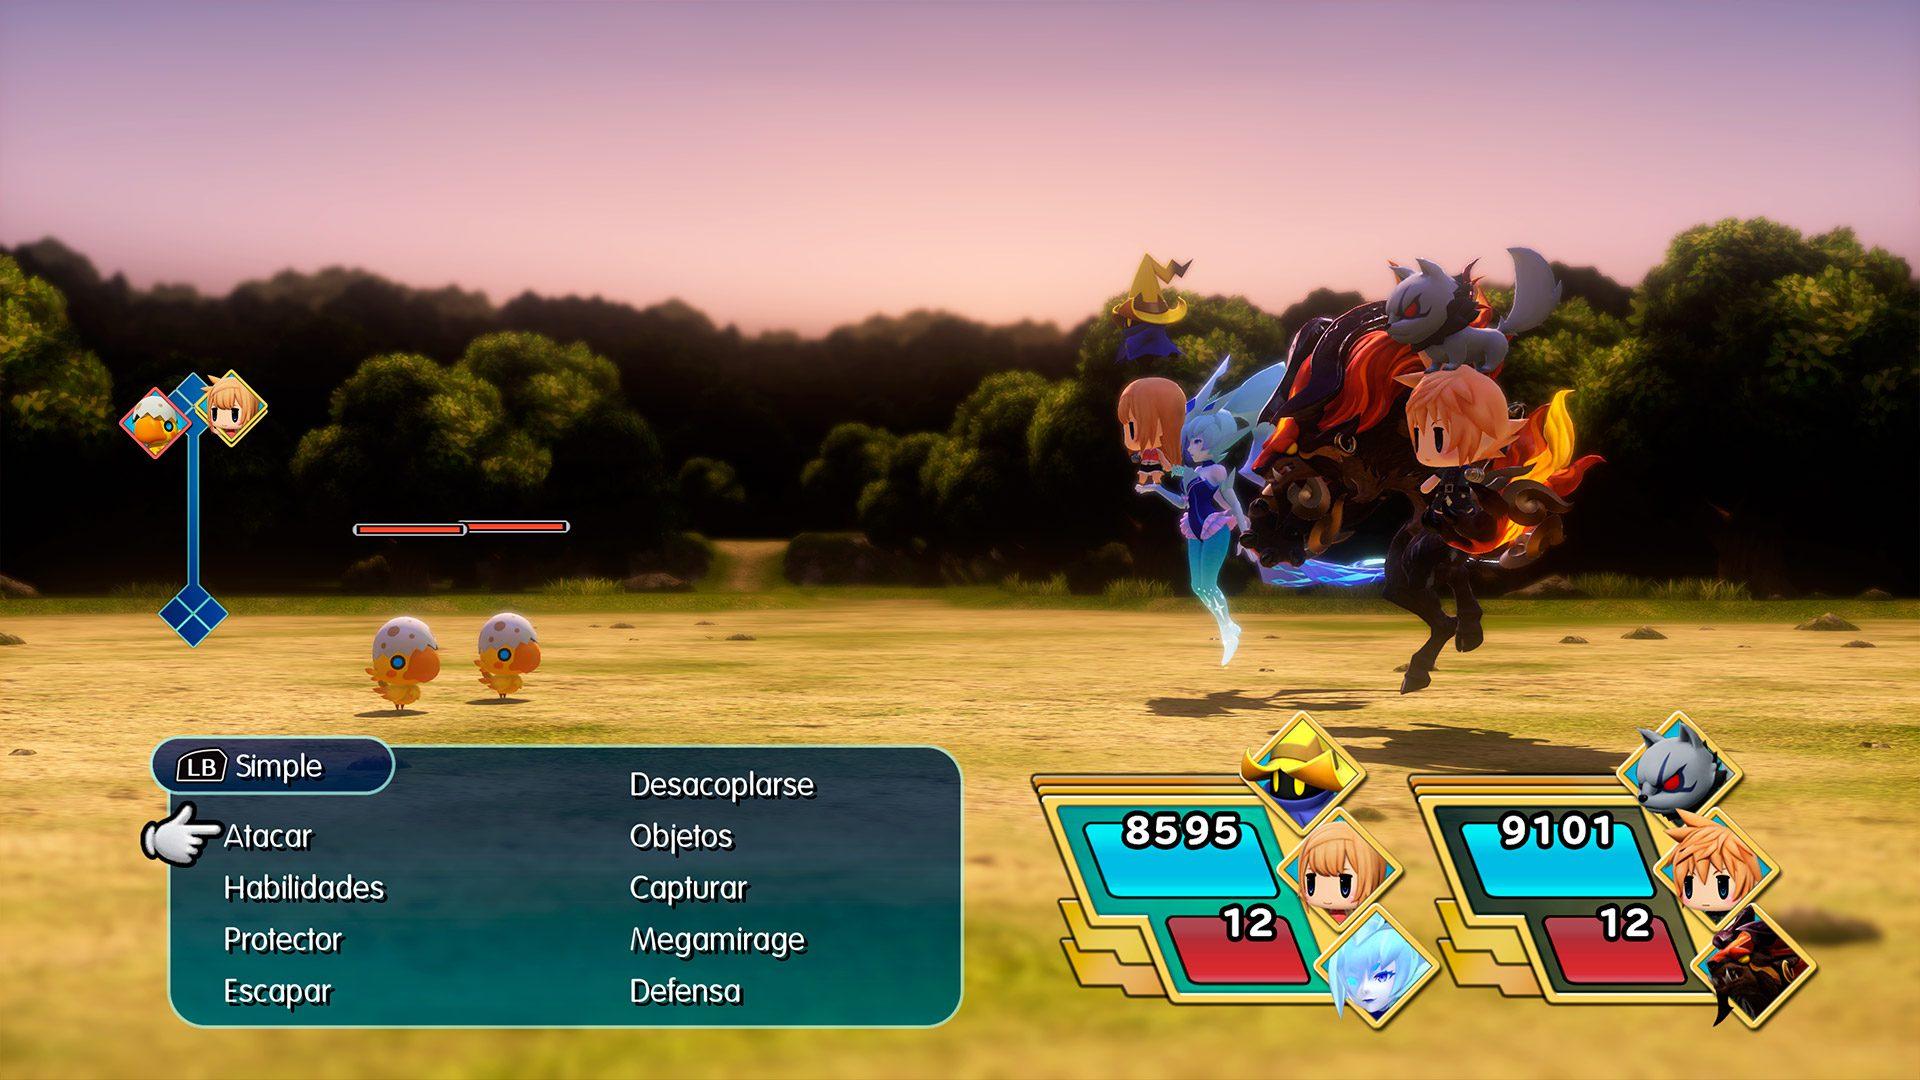 Análisis de World of Final Fantasy Maxima 3